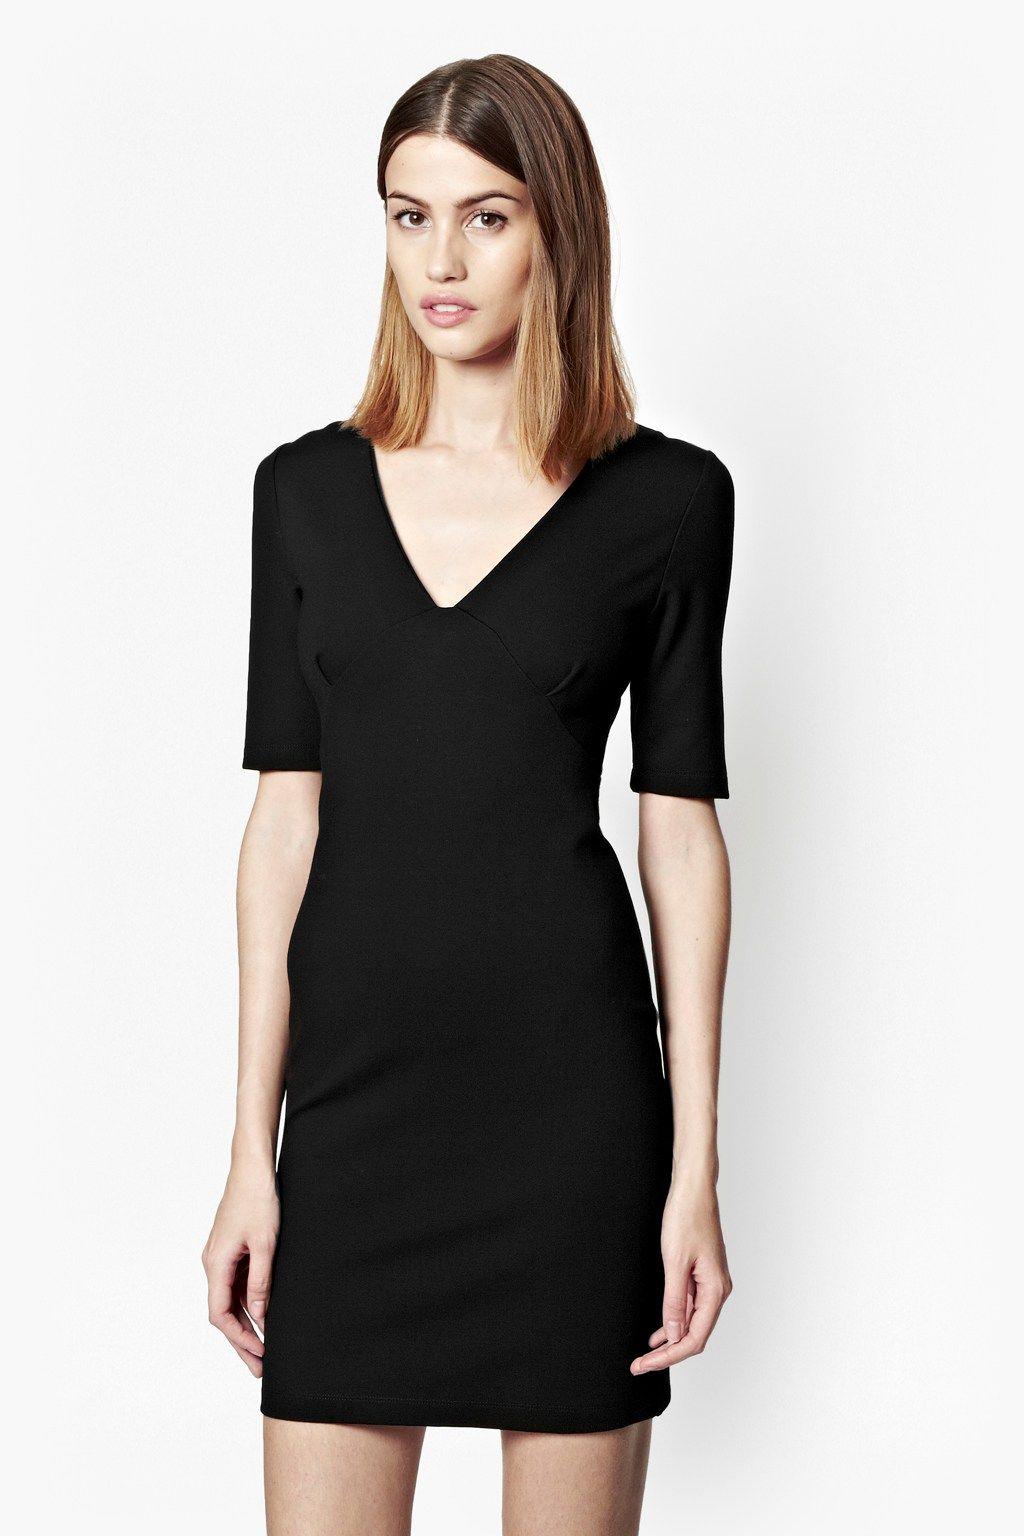 1ffe9f08c19 Lula Stretch V-Neck Dress - Workwear - French Connection ...